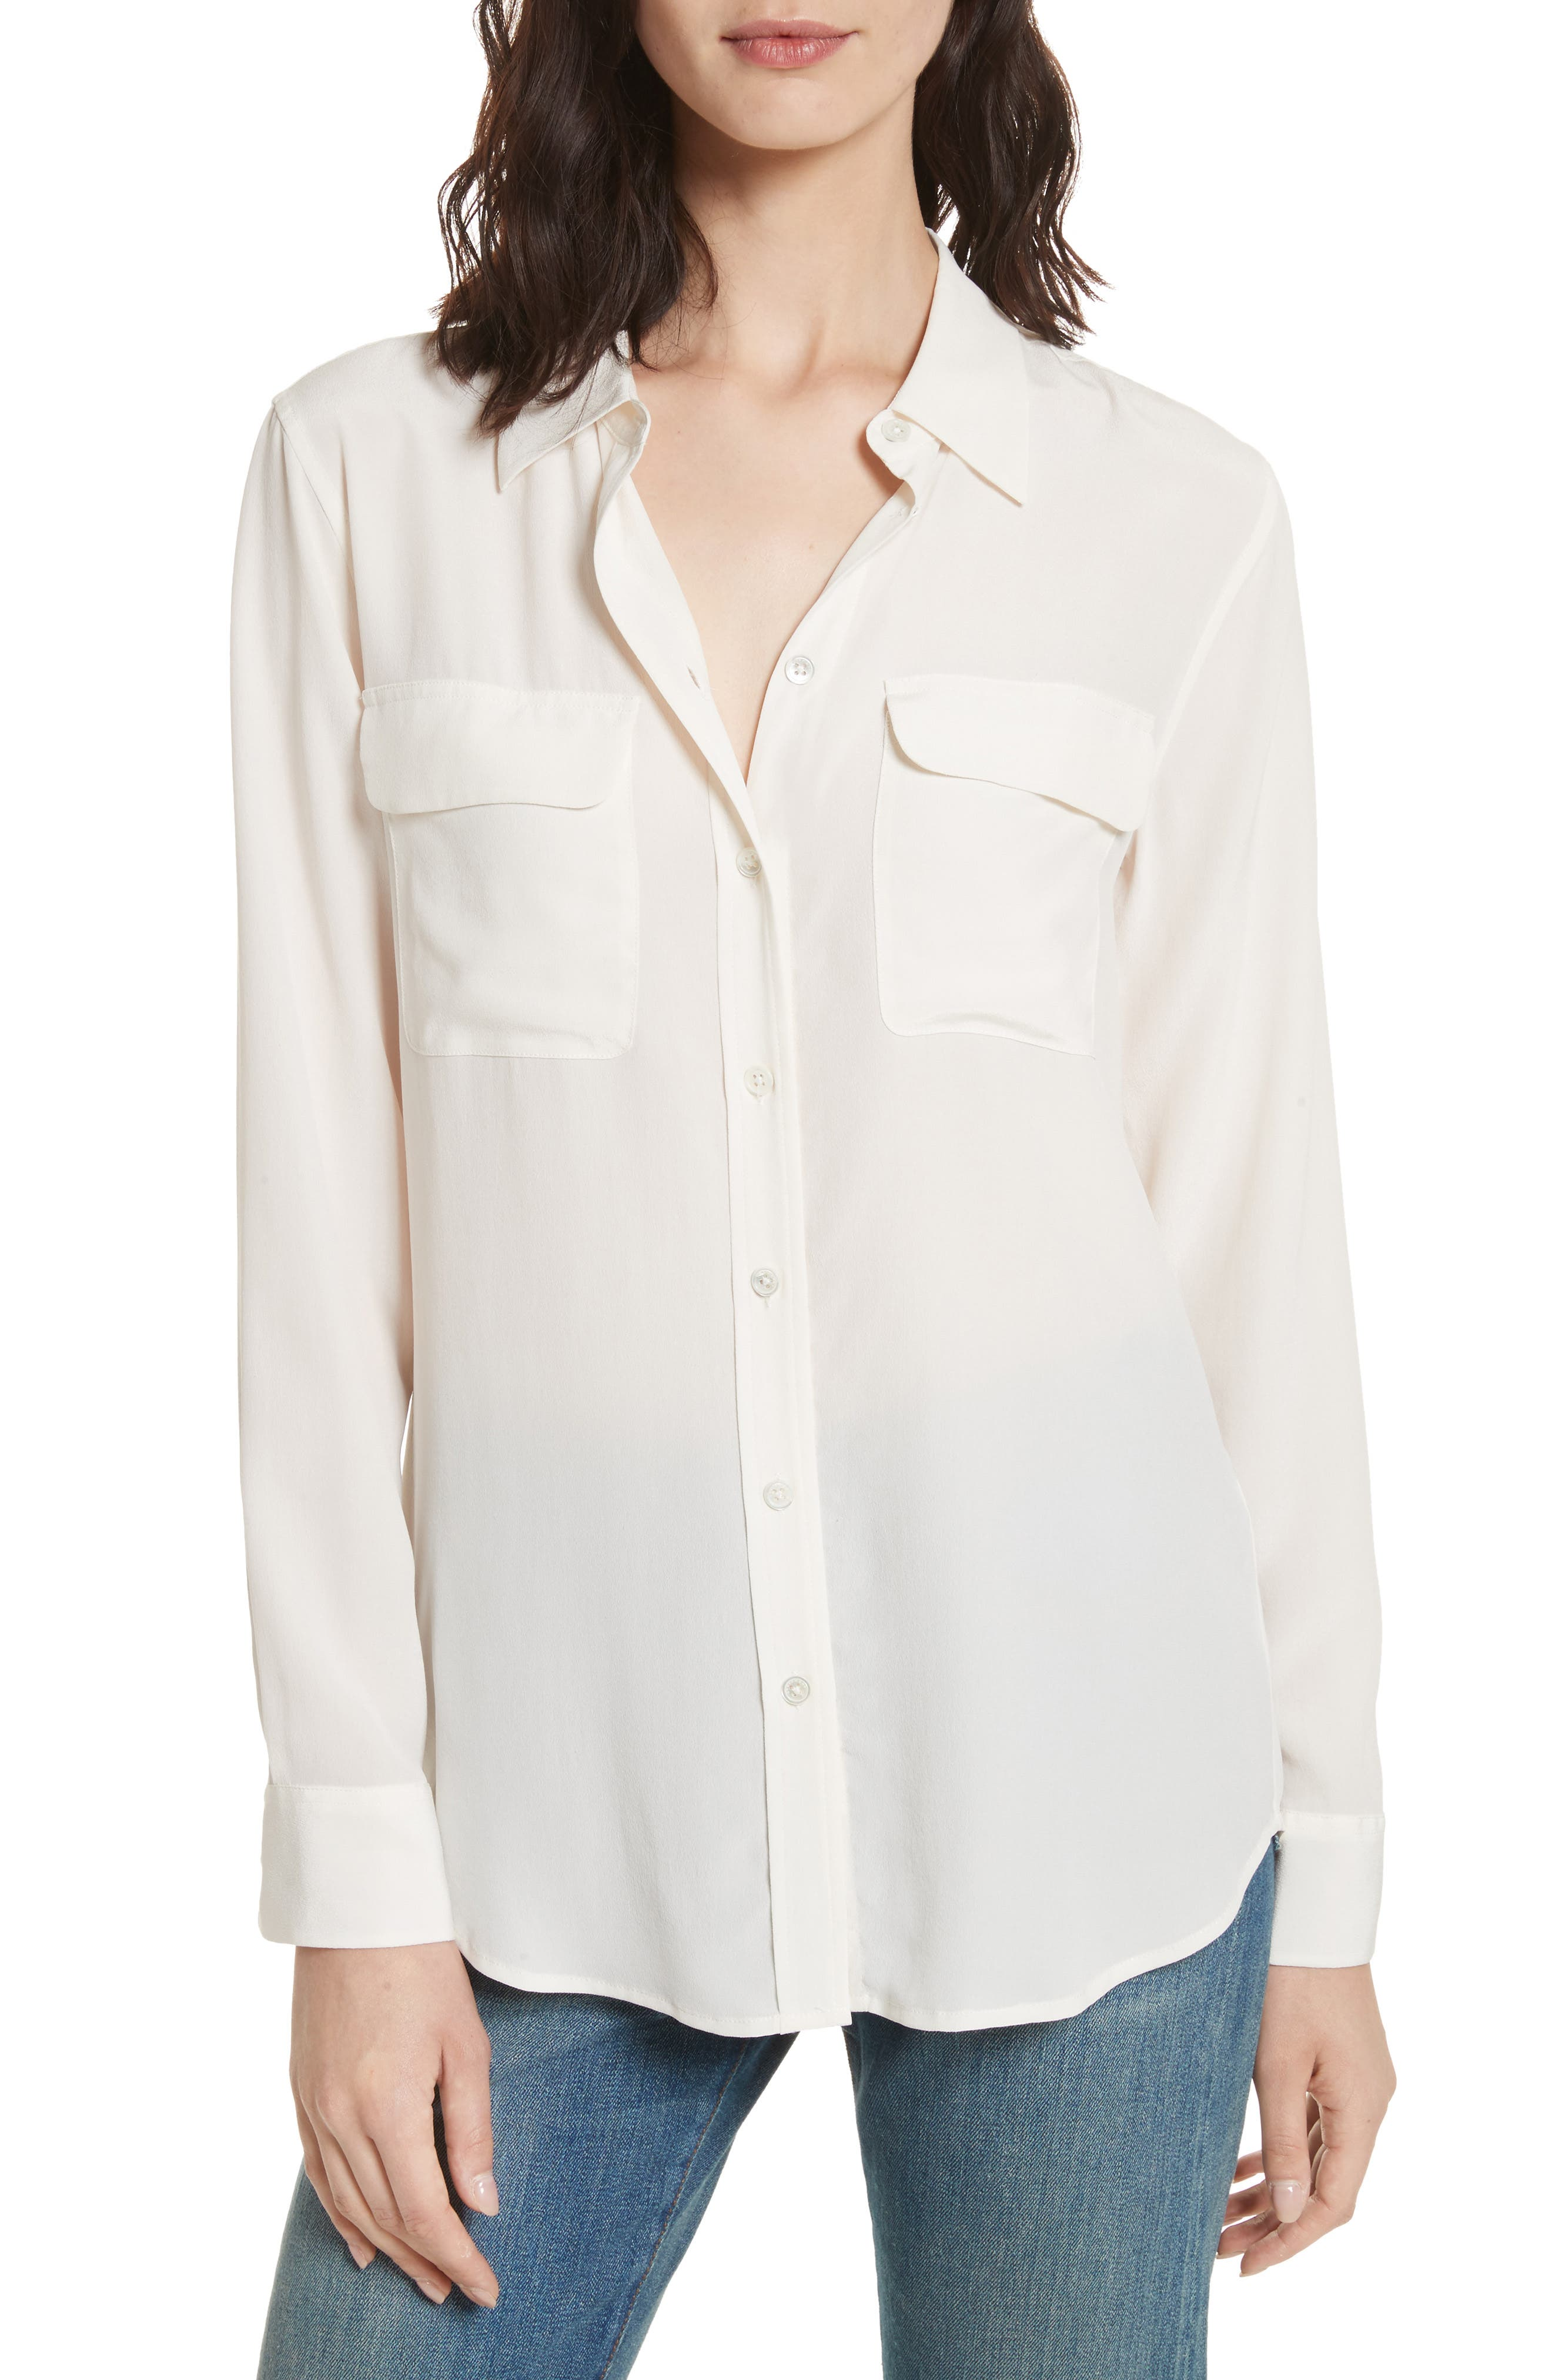 EQUIPMENT 'Slim Signature' Silk Shirt, Main, color, BRIGHT WHITE